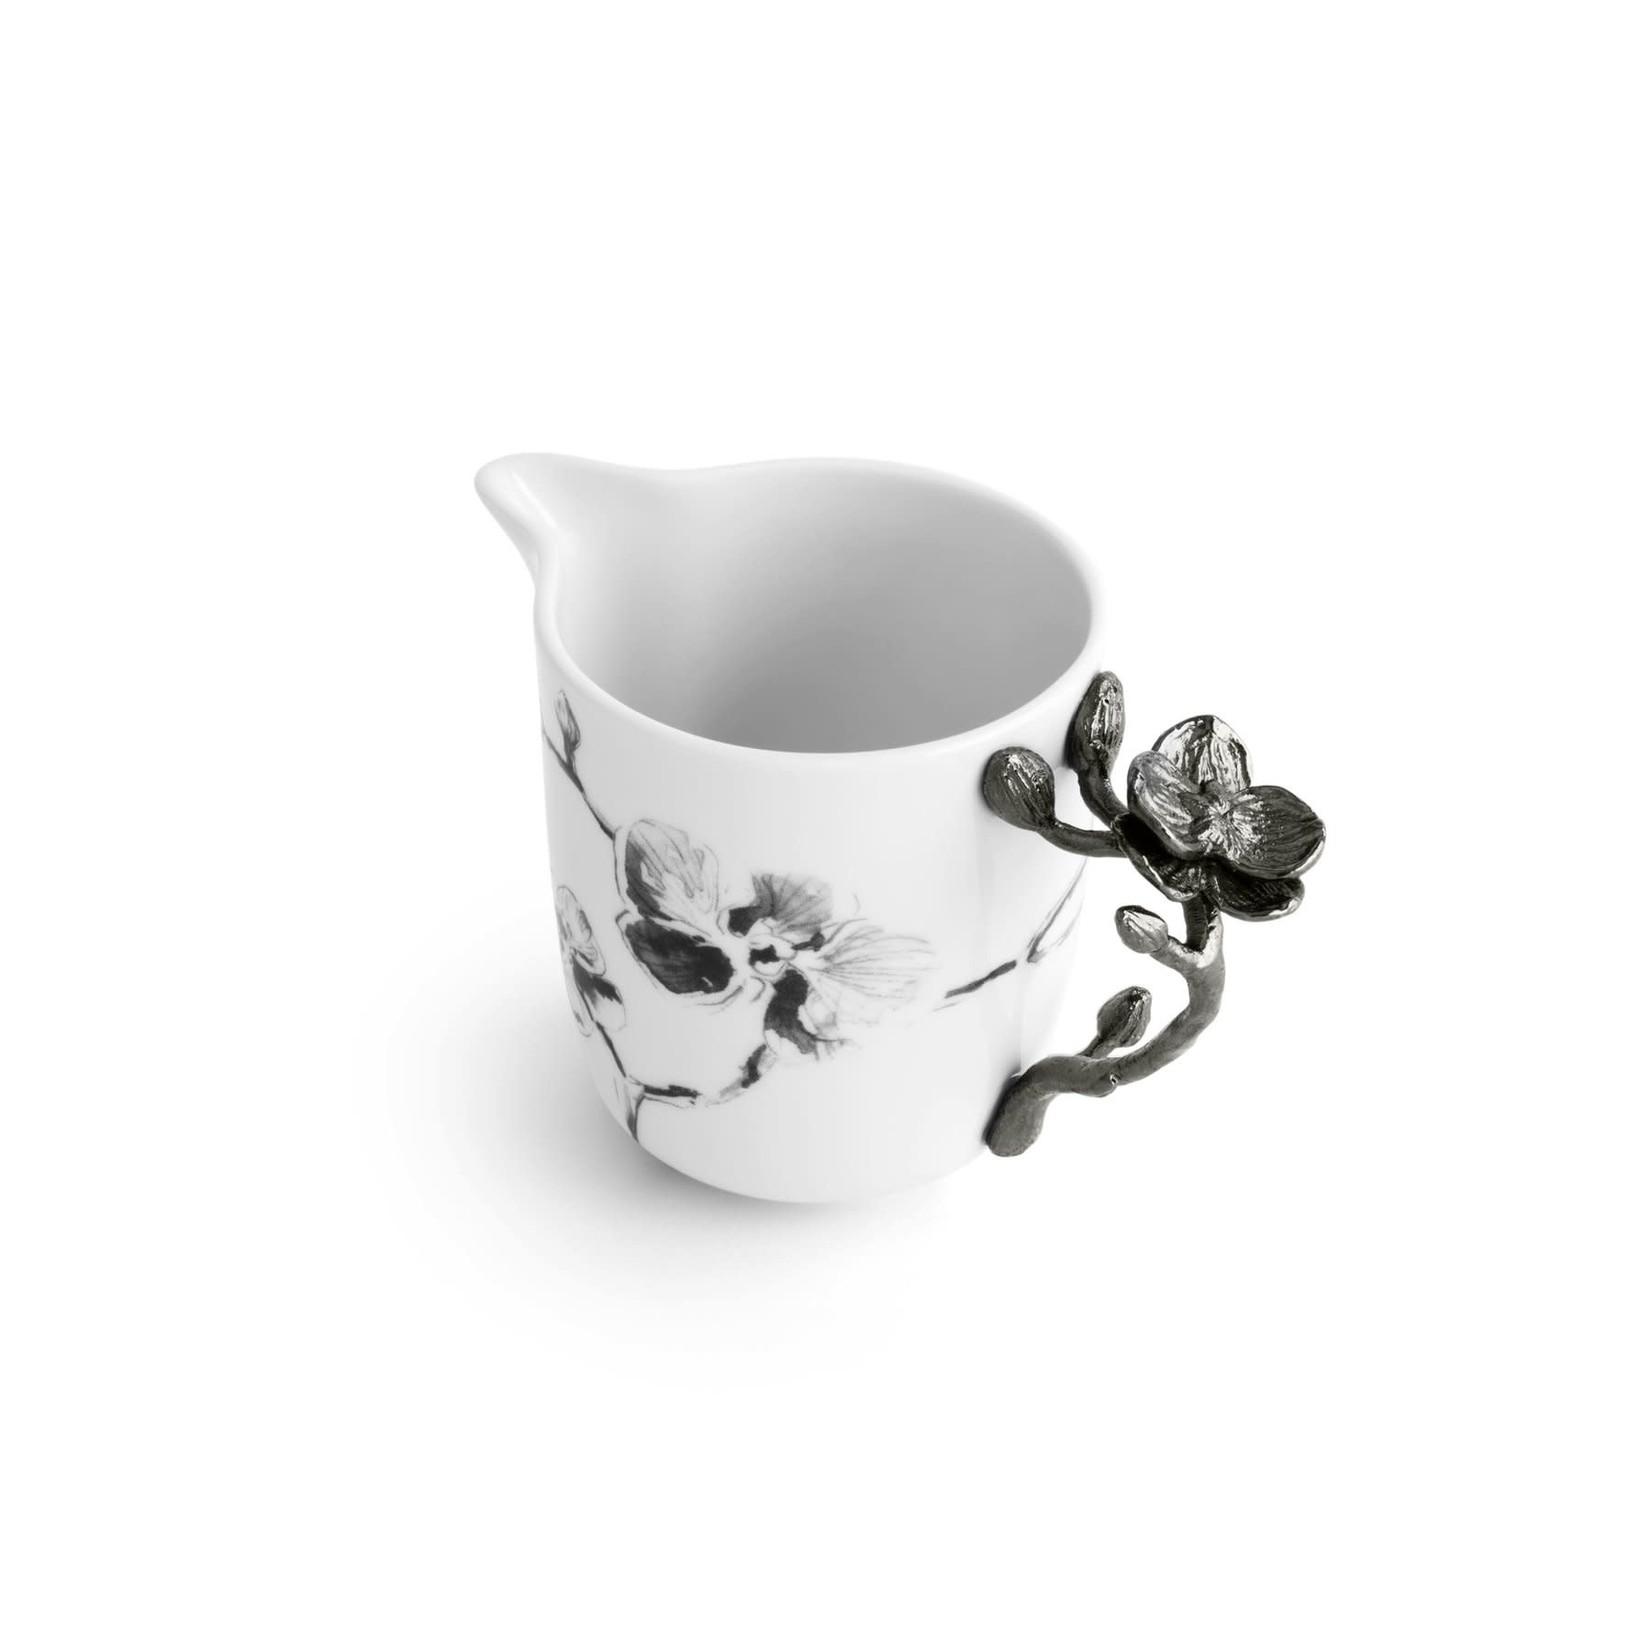 Michael Aram Black Orchid Porcelain Creamer